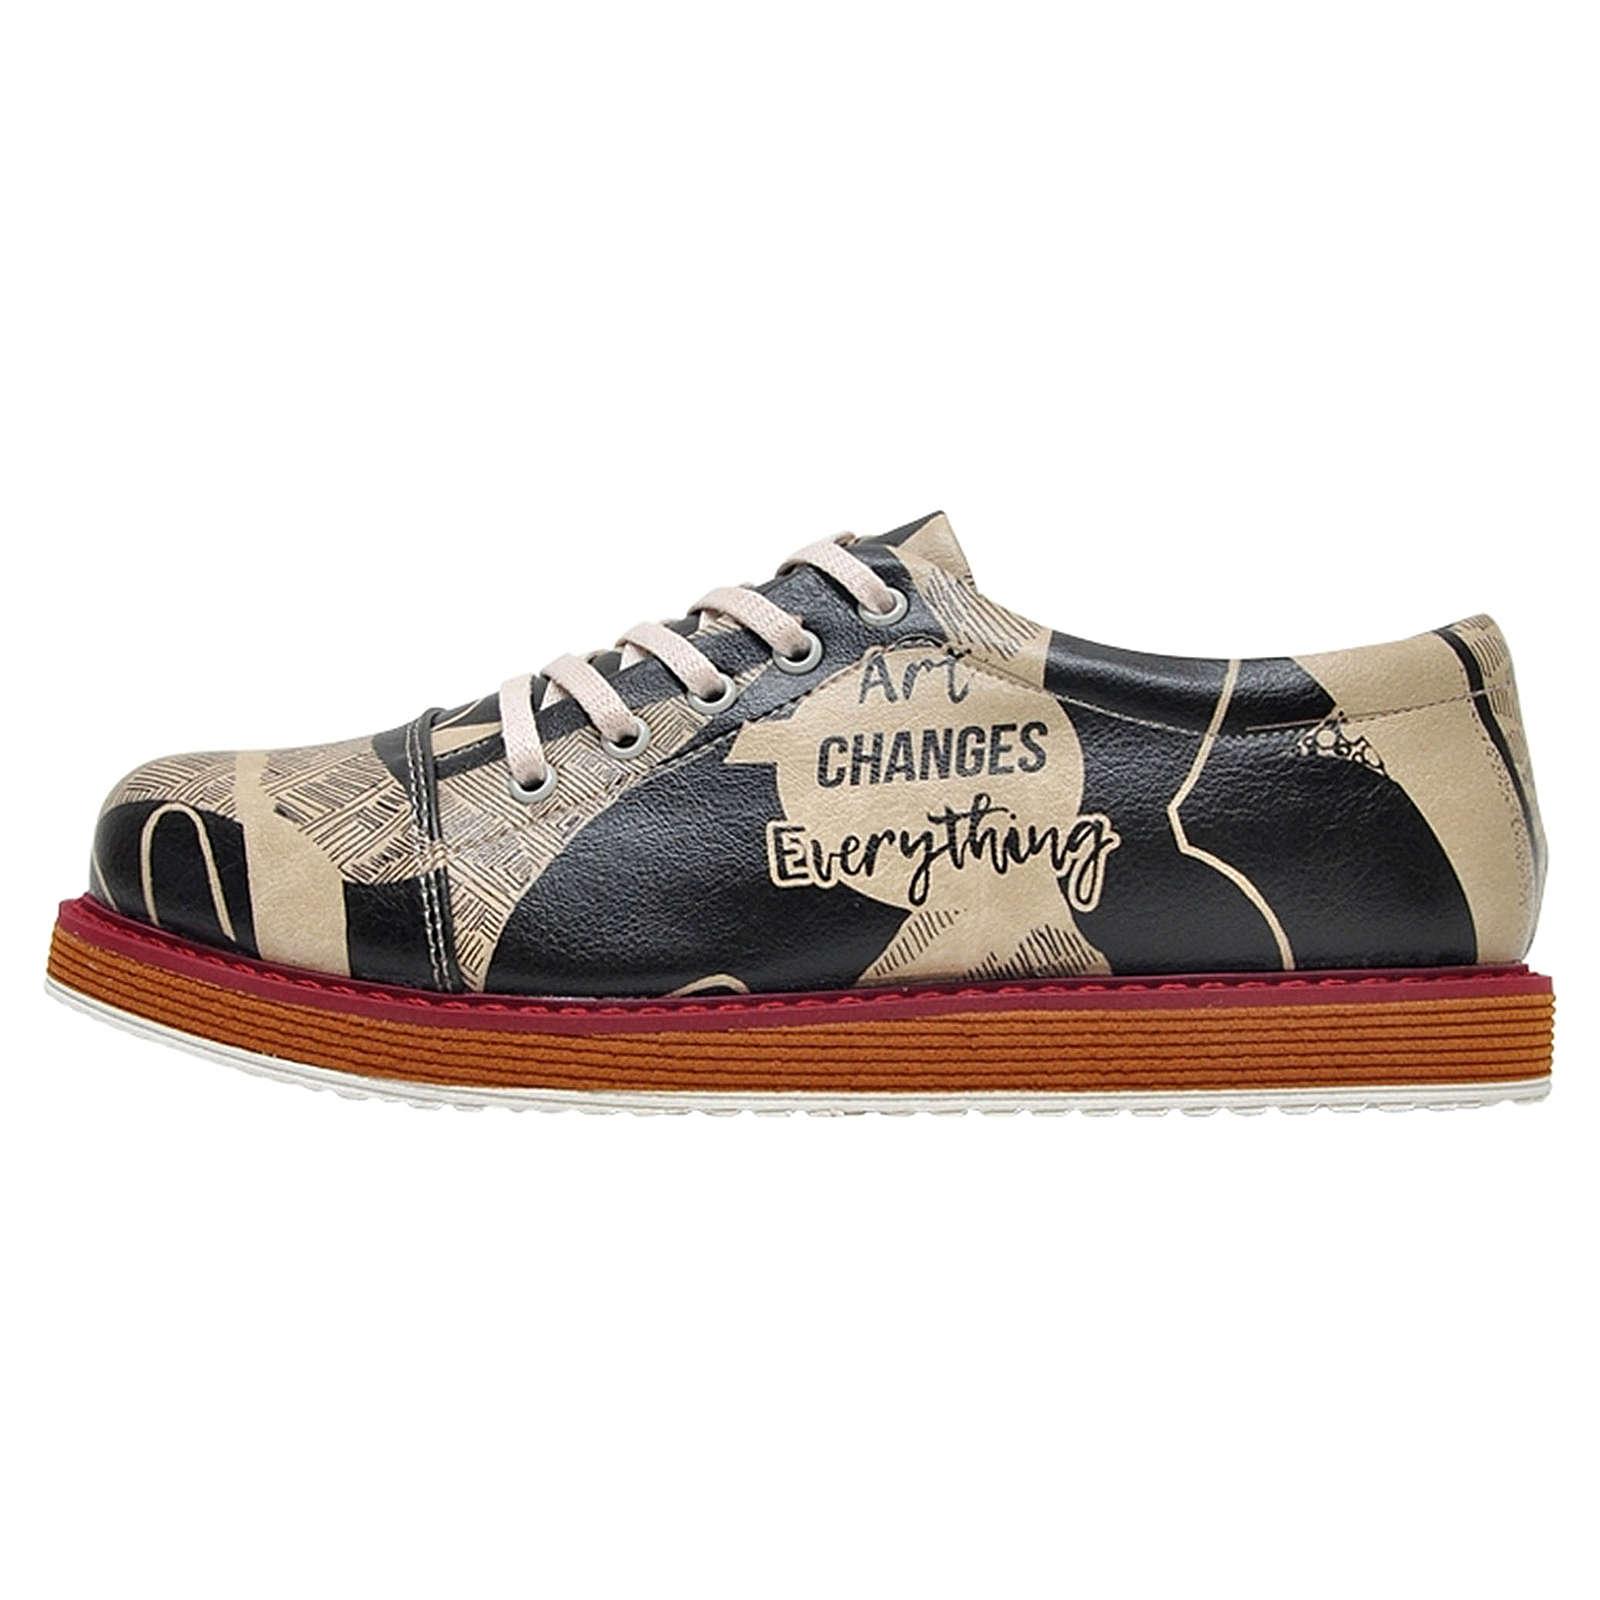 Dogo Shoes DOGO Broke's Art Changes Everything Schnürschuhe mehrfarbig Damen Gr. 38